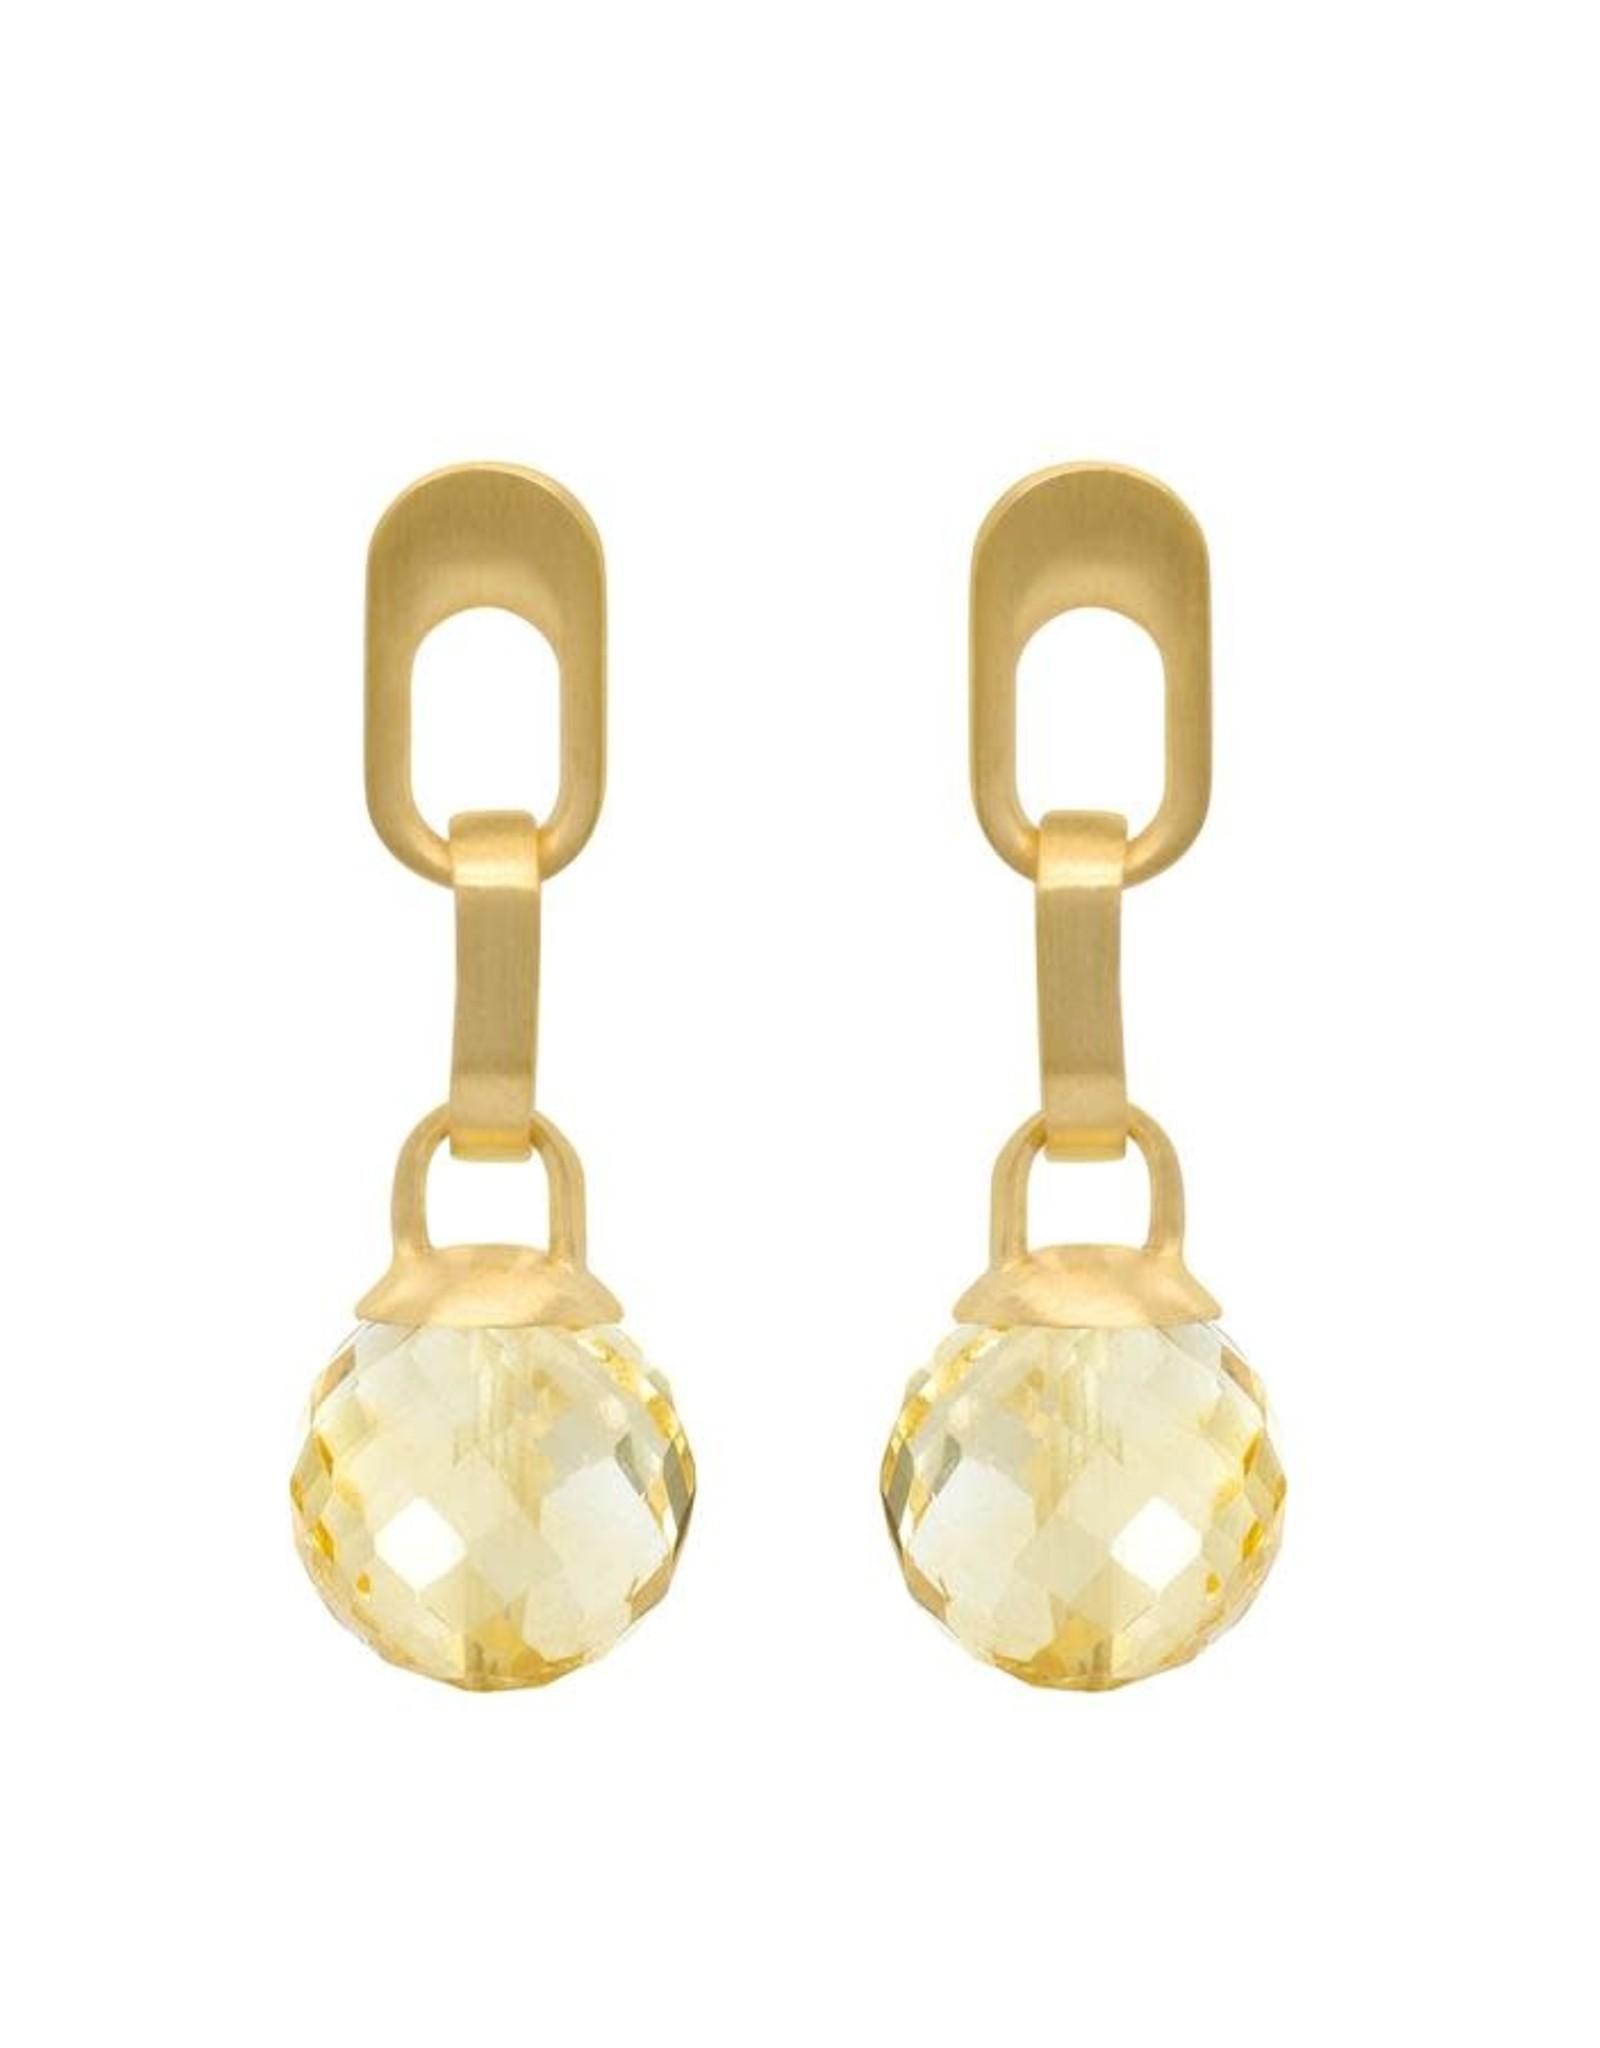 Dean Davidson Manhattan Gemstone Drop Earrings - Citrine